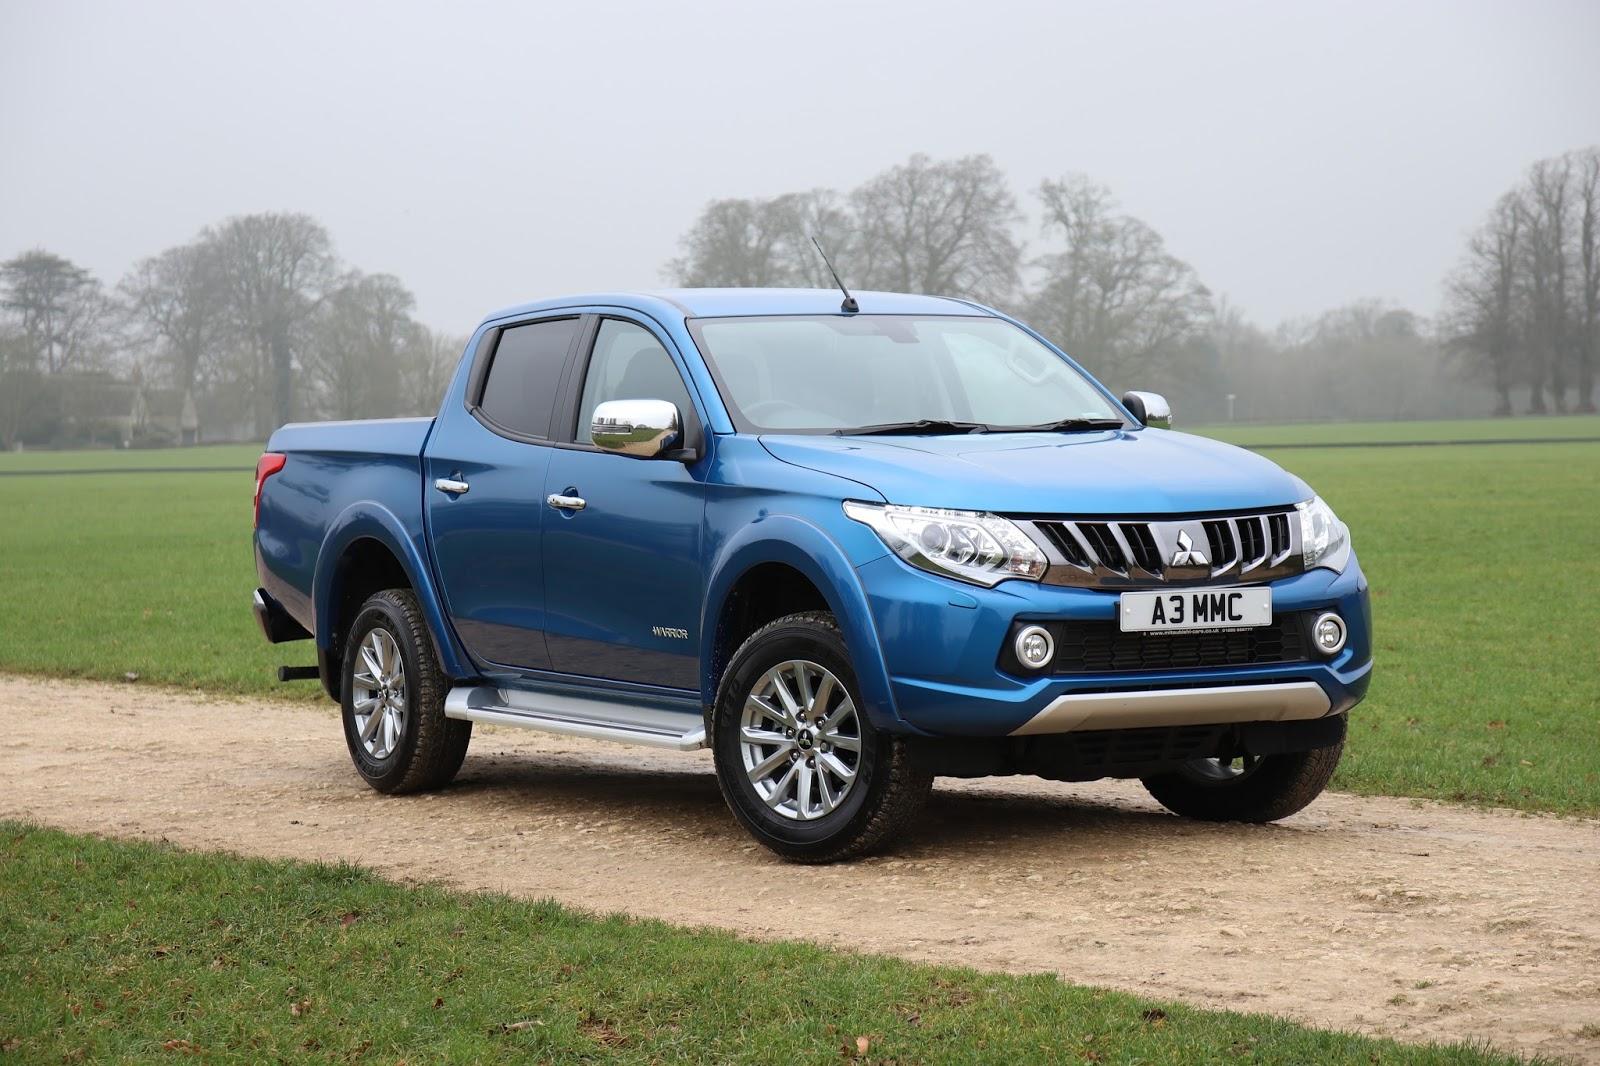 Mitsubishi Upgrades L200 Pickup Truck To Tow Heavier Stuff | Carscoops